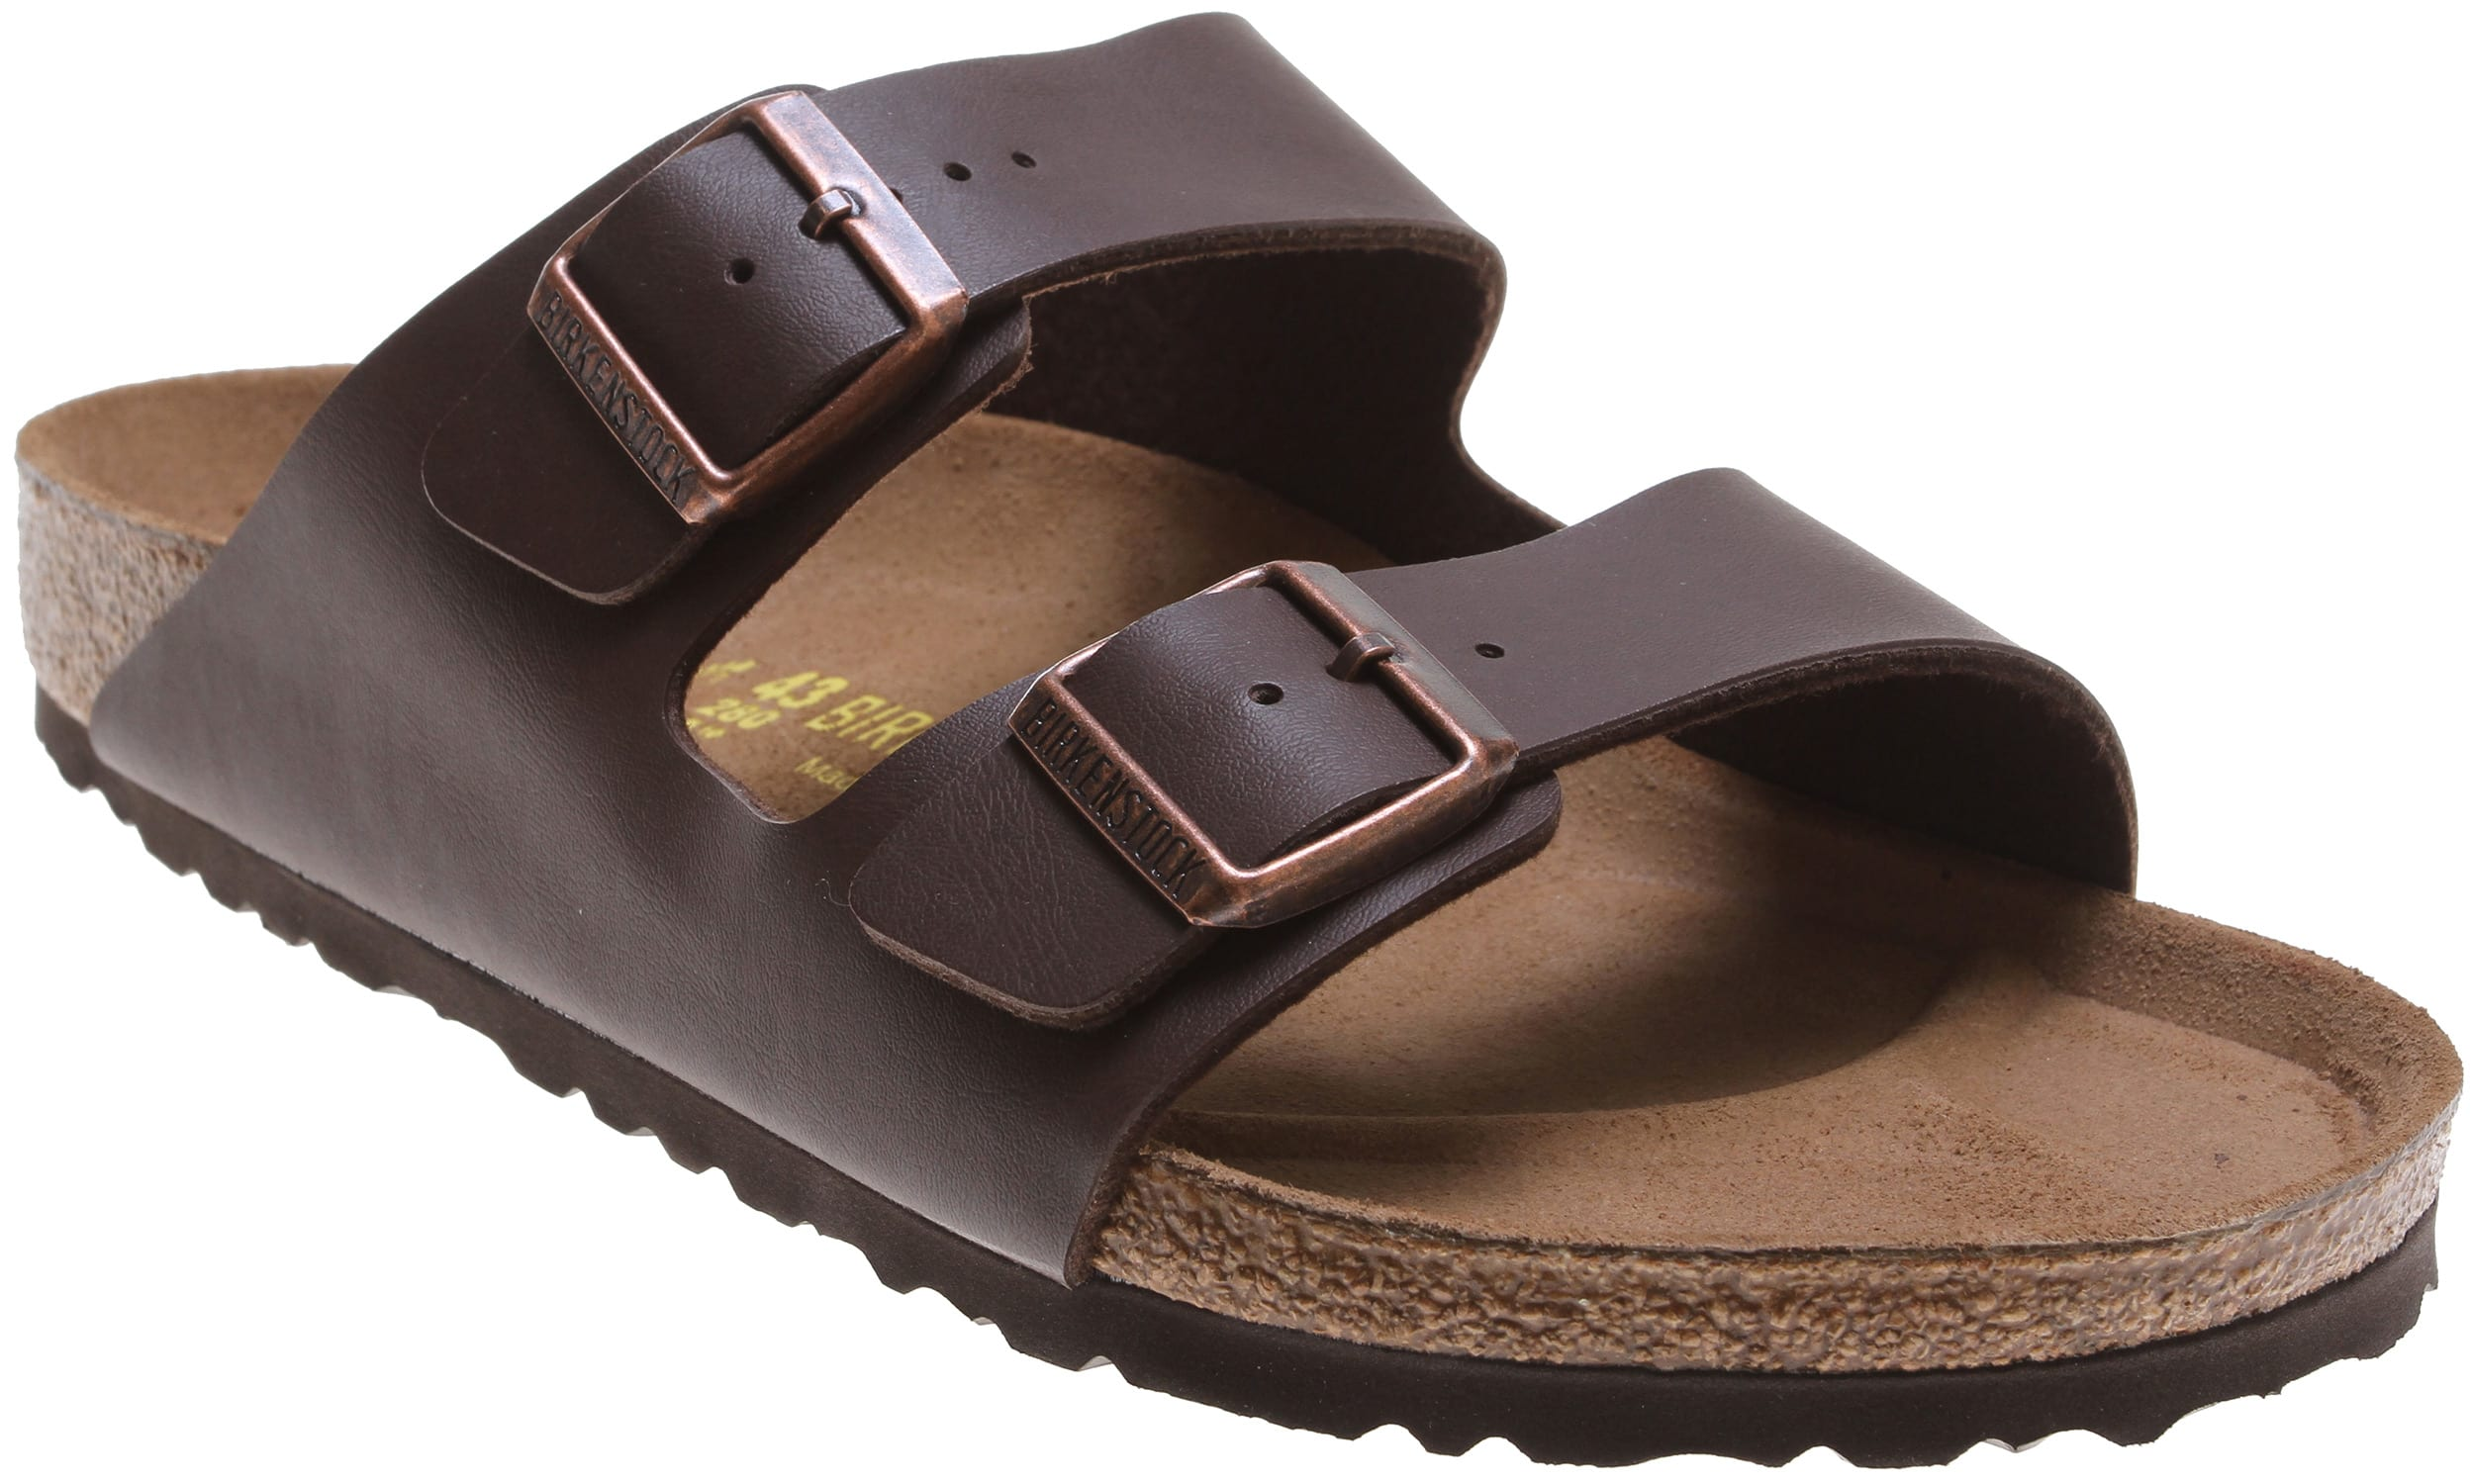 Birkenstock Sandals Are On Sale